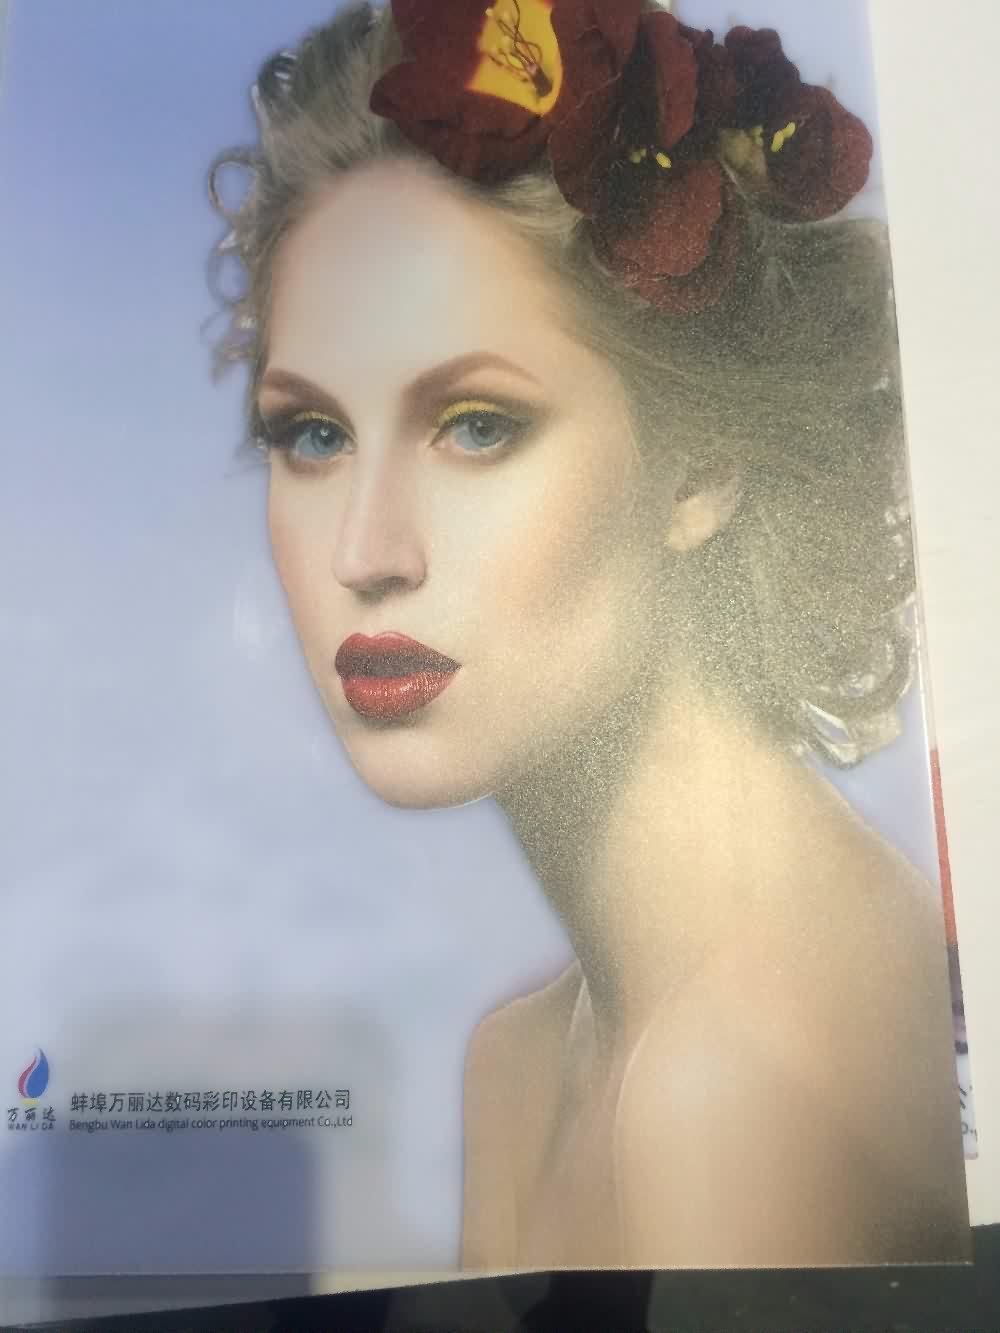 Professional China  Ceramic UV printer UV2513 Flatbed UV printer Wholesale to Borussia Dortmund